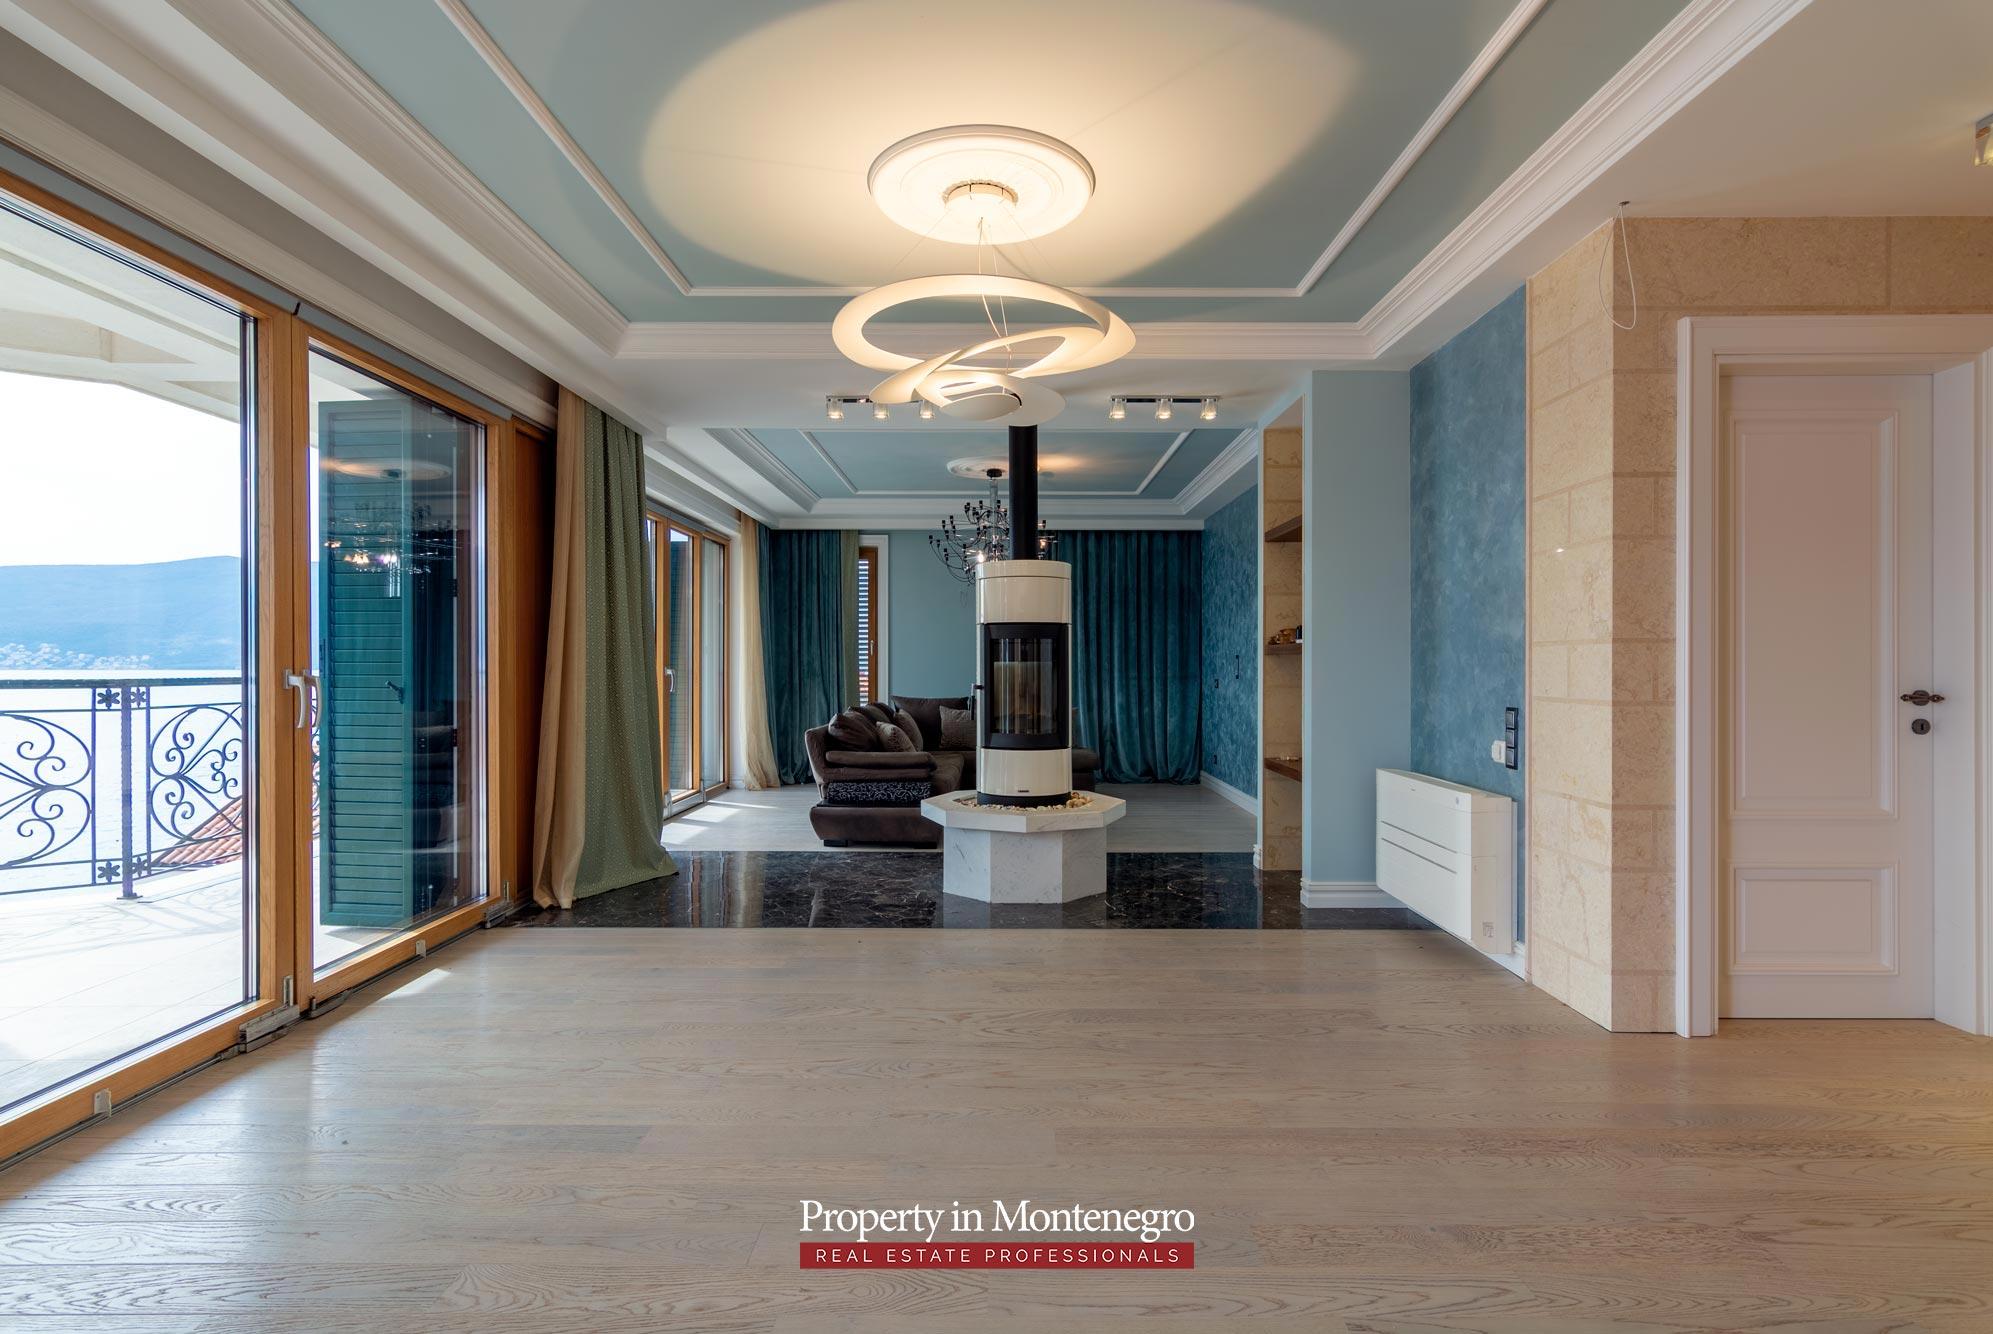 Luxury-waterfront-villa-for-sale-in-Montenegro (22).jpg